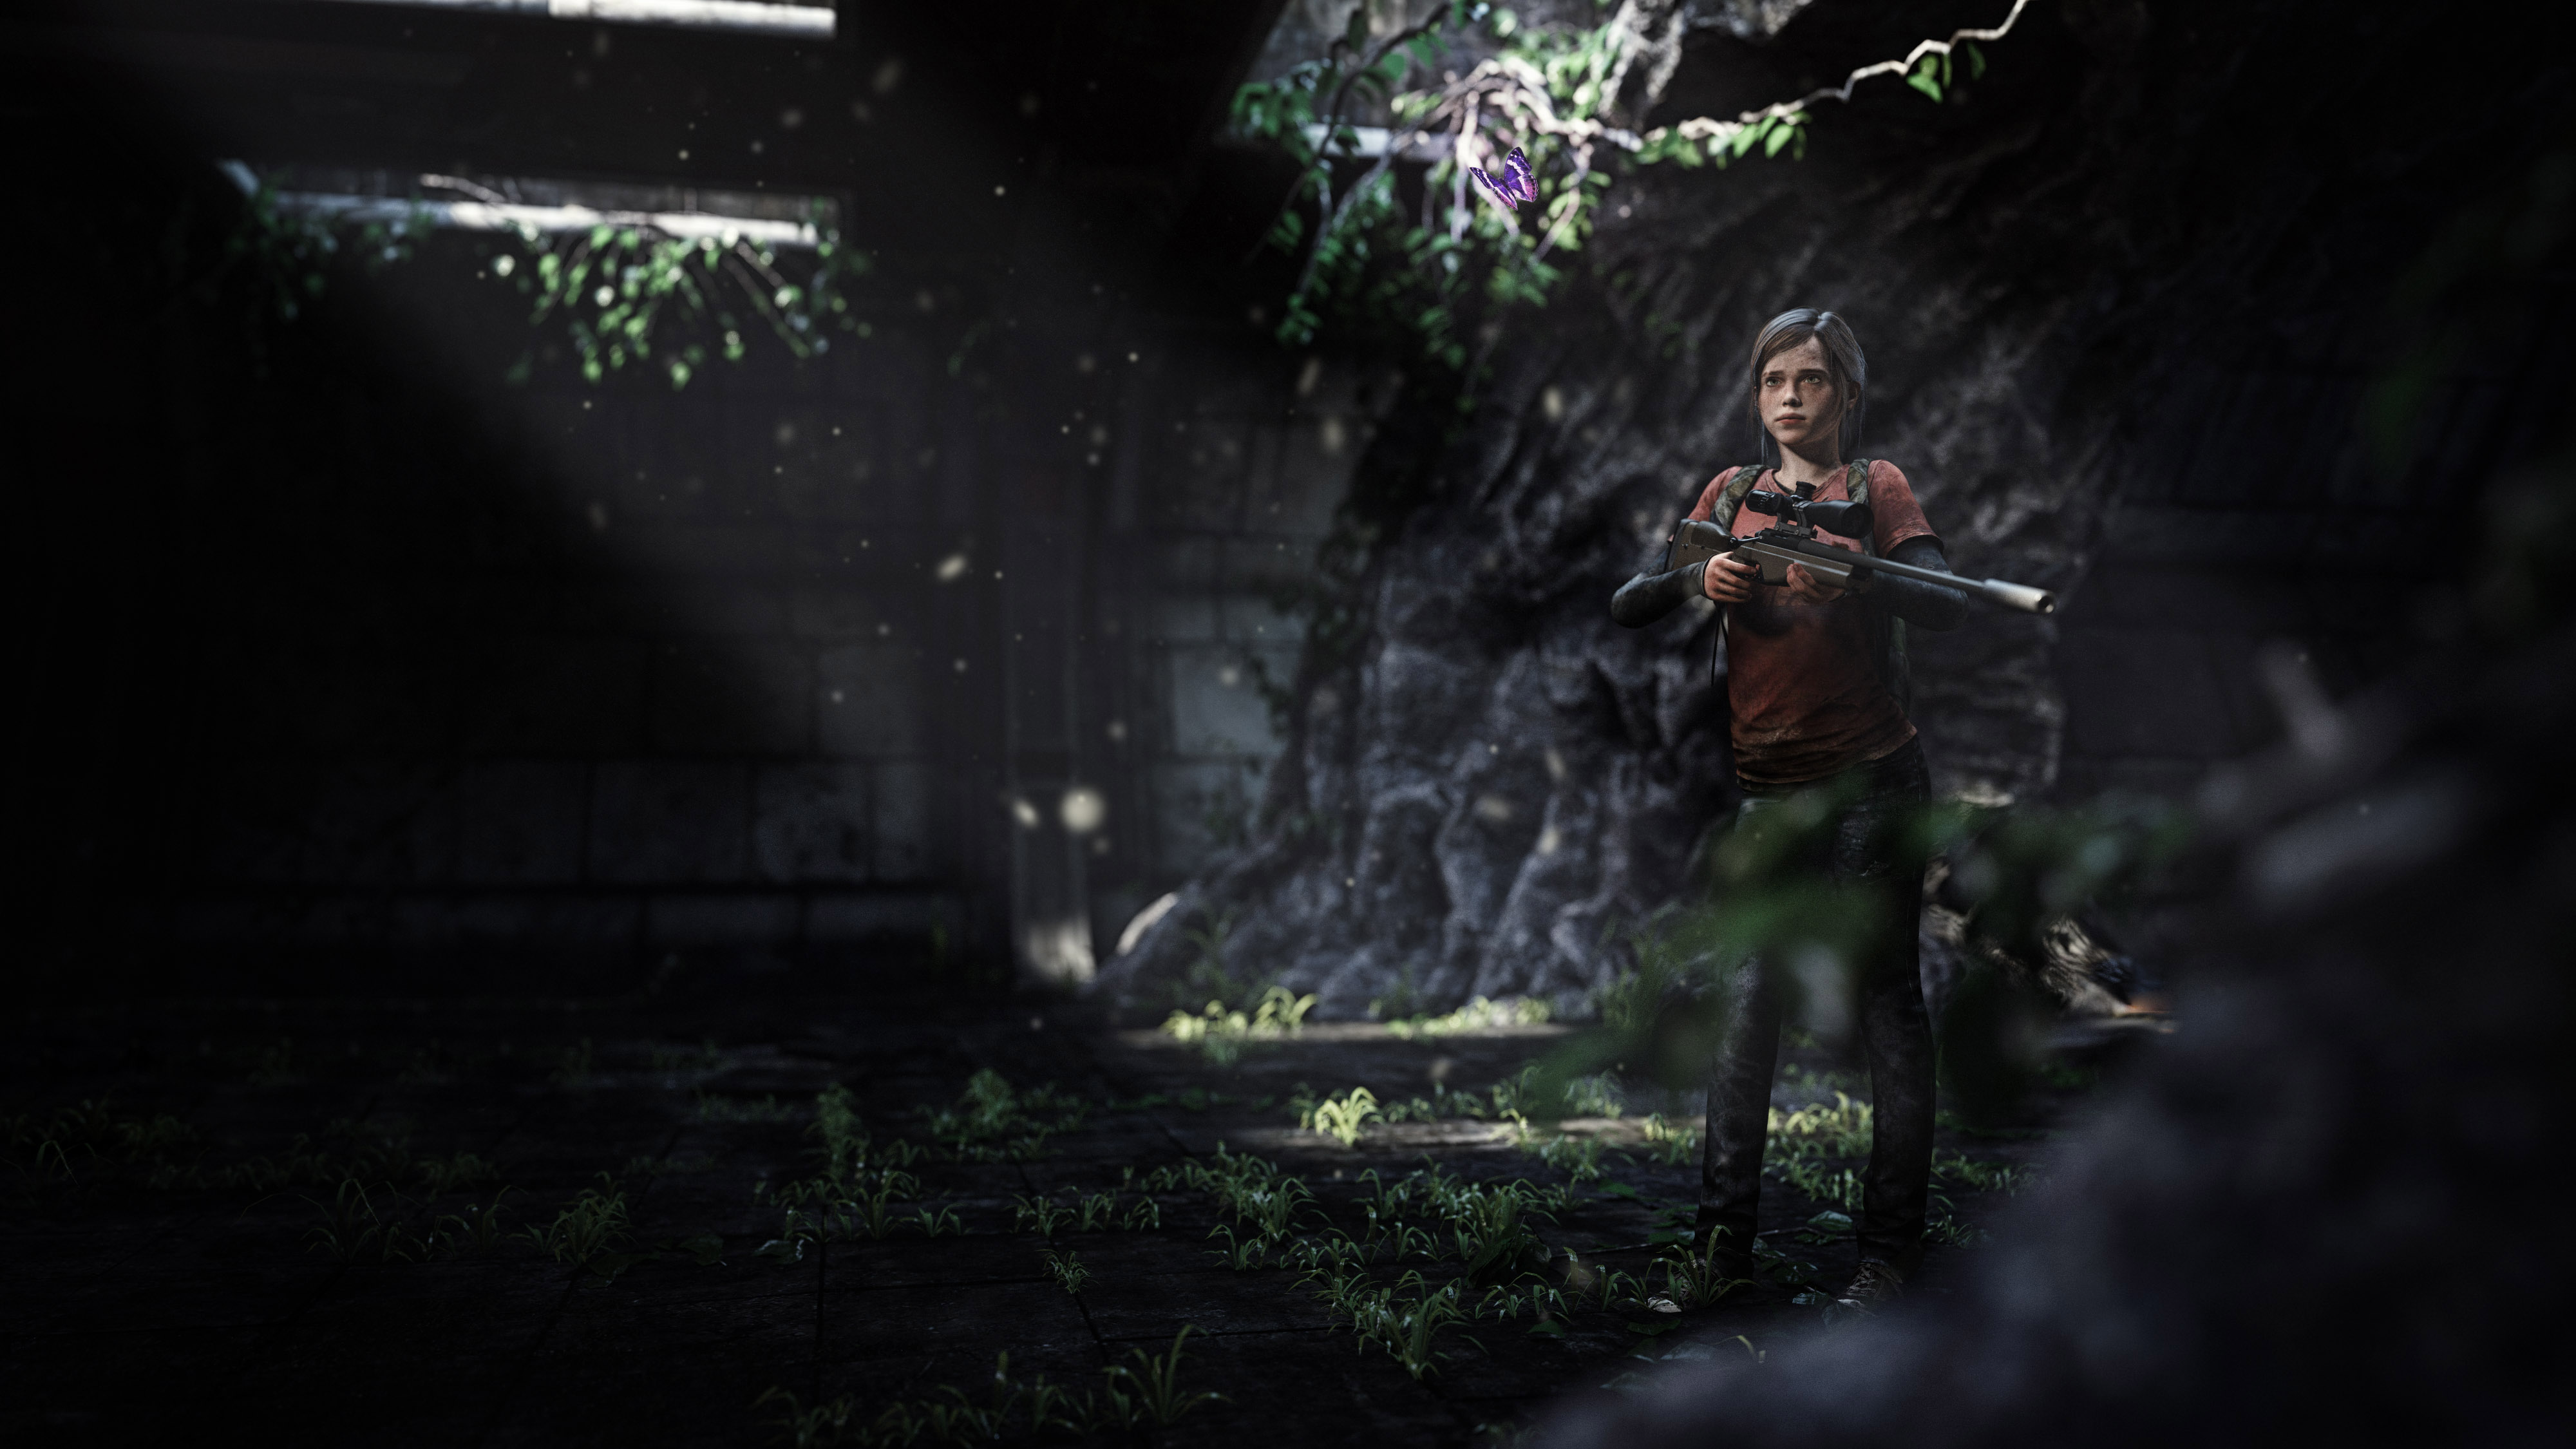 The Last Of Us Wallpaper 4k: 3840x2400 Elle The Last Of Us 3d Art 4k HD 4k Wallpapers